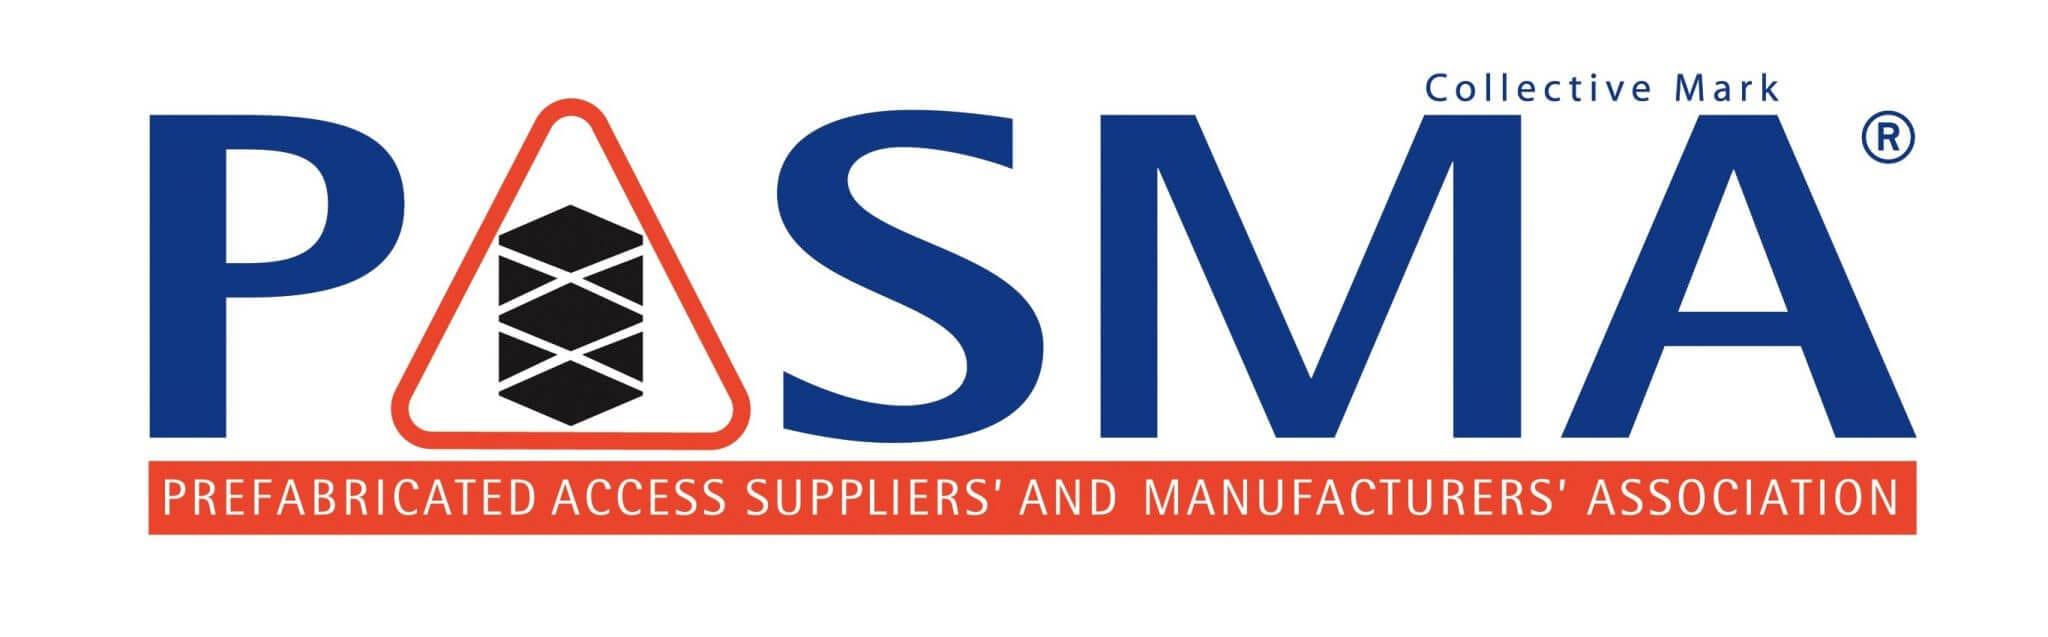 Aston Services Facility Accreditation - PASMA